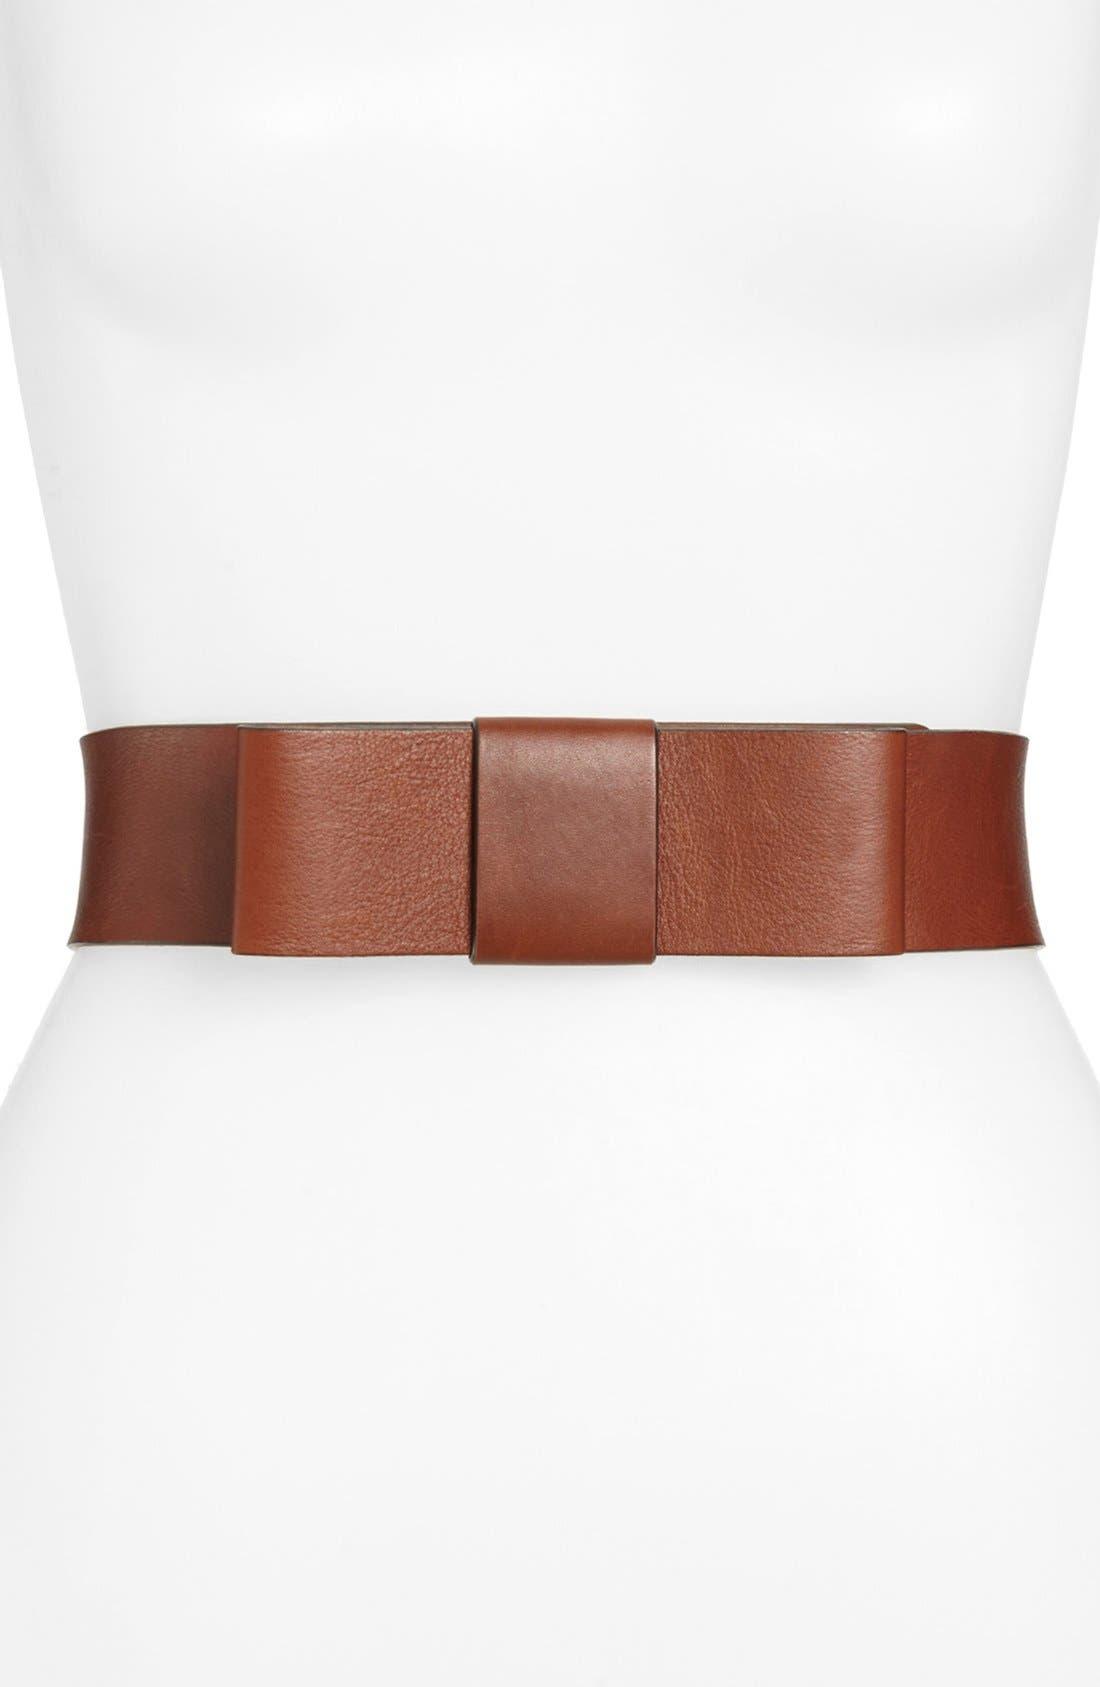 Alternate Image 1 Selected - kate spade new york 'bow' leather belt